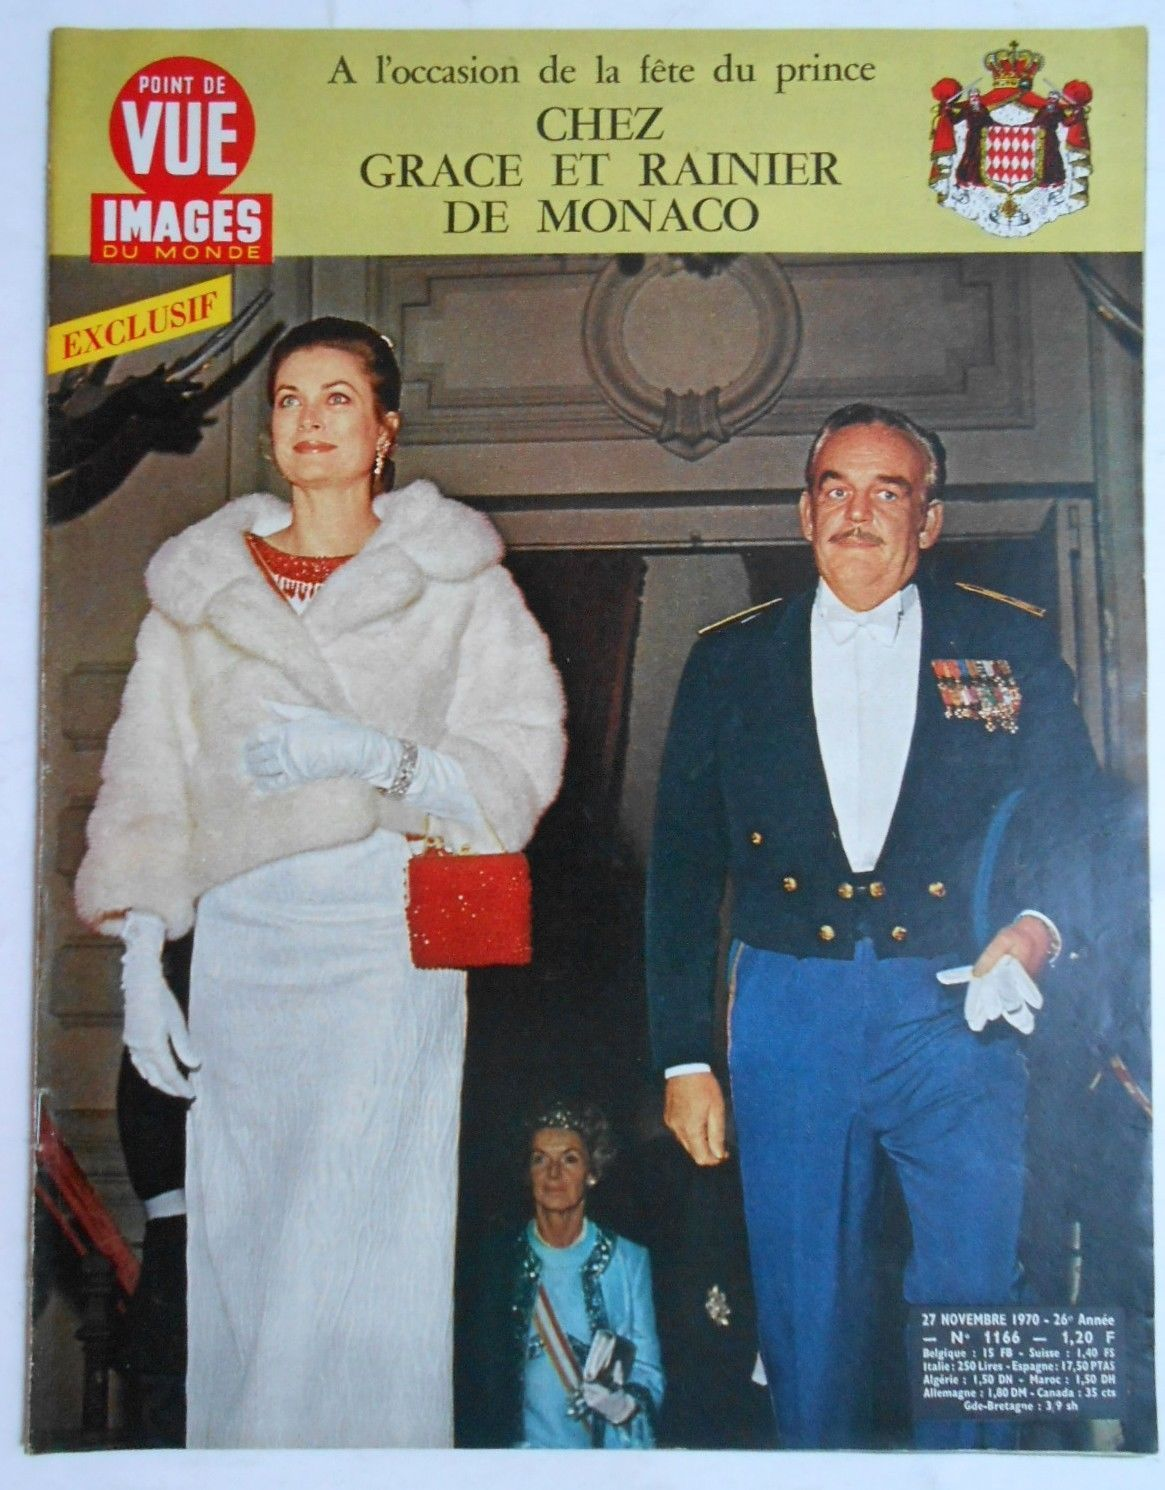 Graceandfamily Point De Vue Images Du Monde N 1166 1970 The Princely Family Revistas Precioso